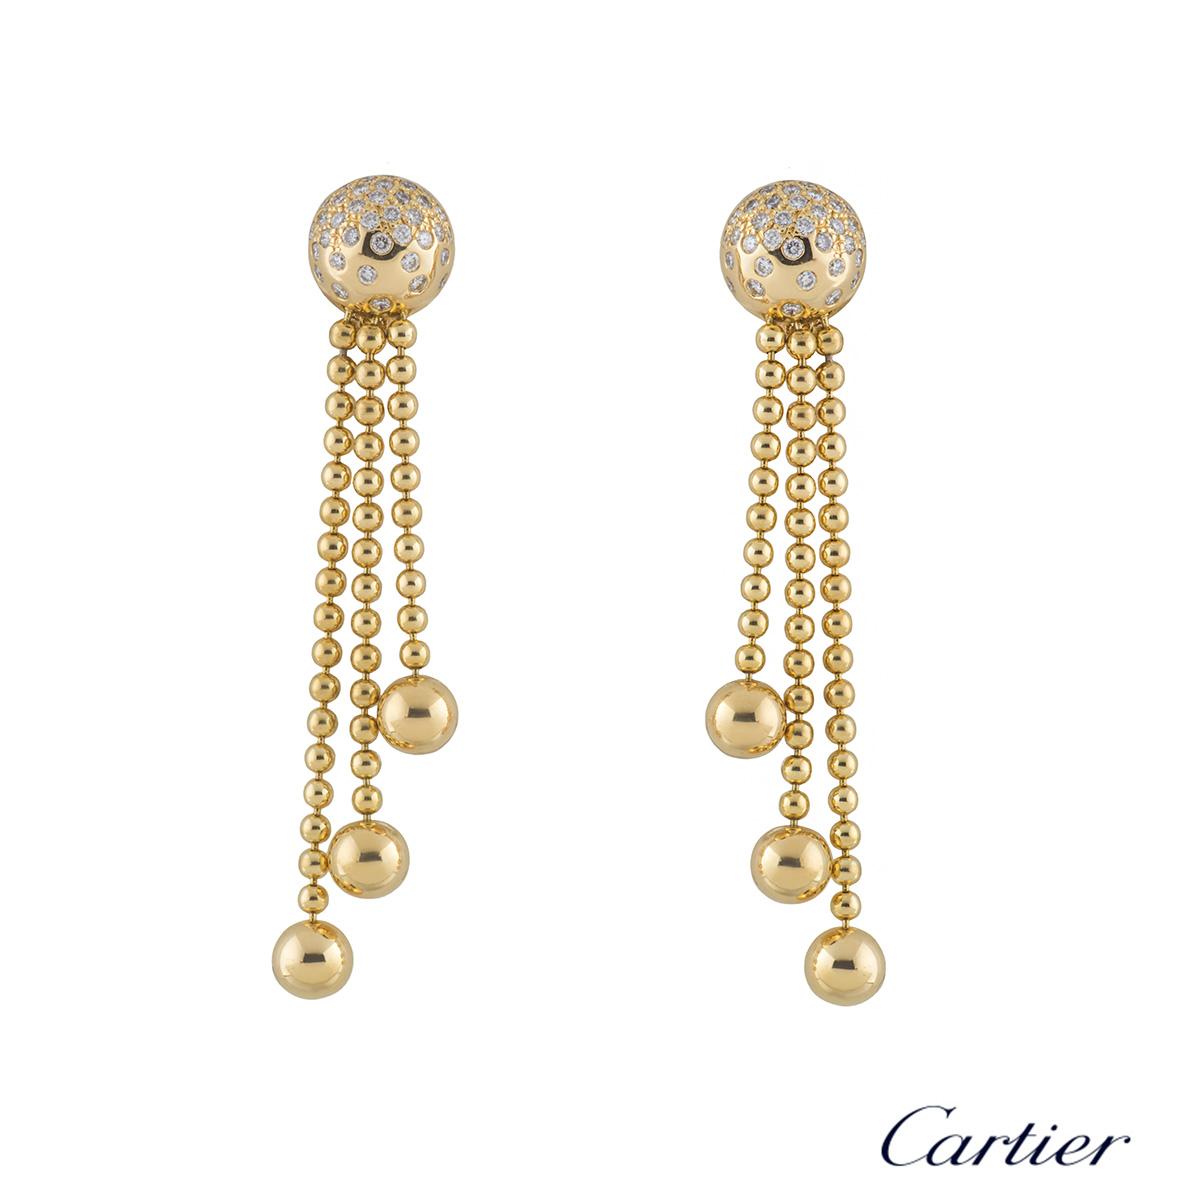 Cartier Yellow Gold Diamond Draperie Jewellery Suite